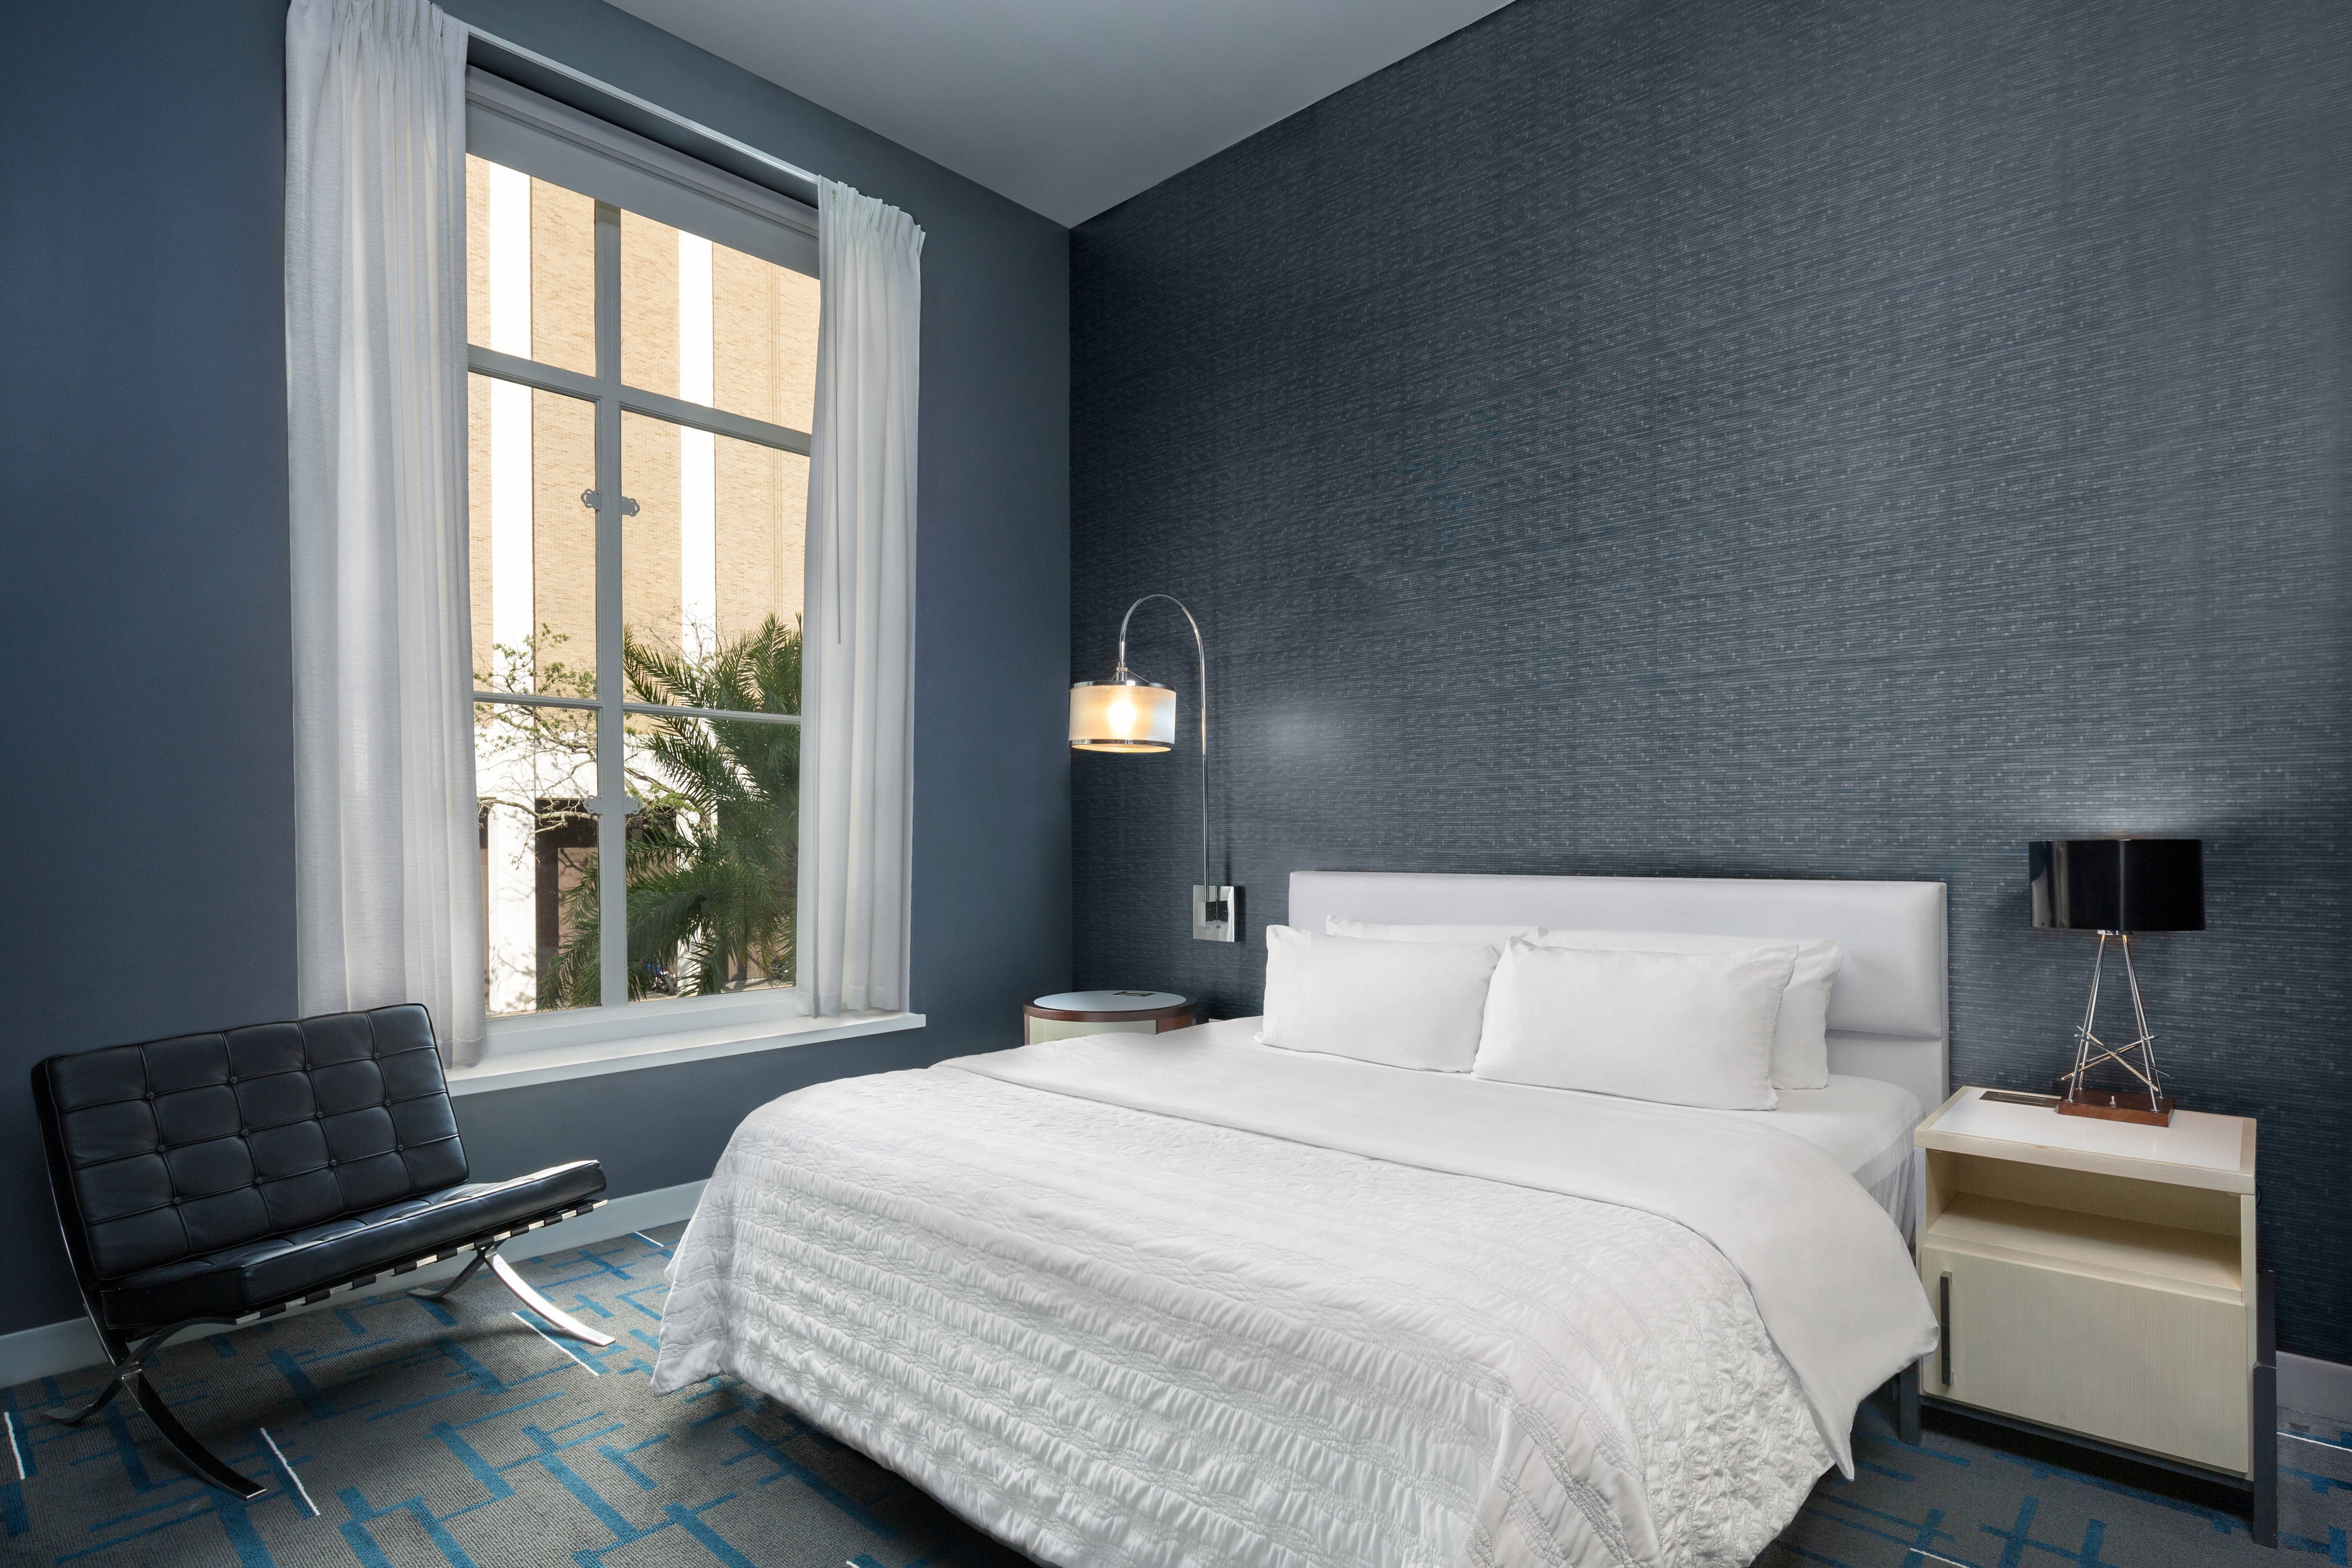 Deluxe-Gästezimmer mit Kingsize-Bett